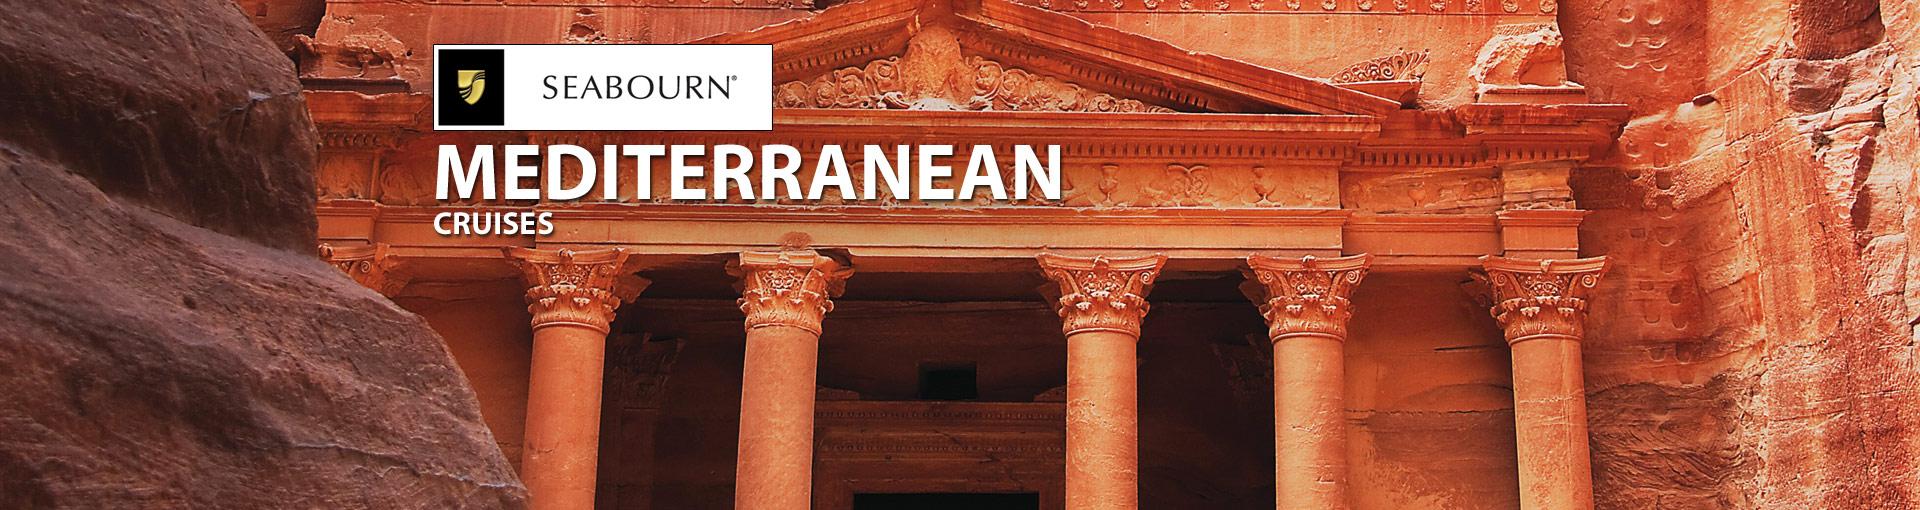 Seabourn Cruise Line Mediterranean Cruises